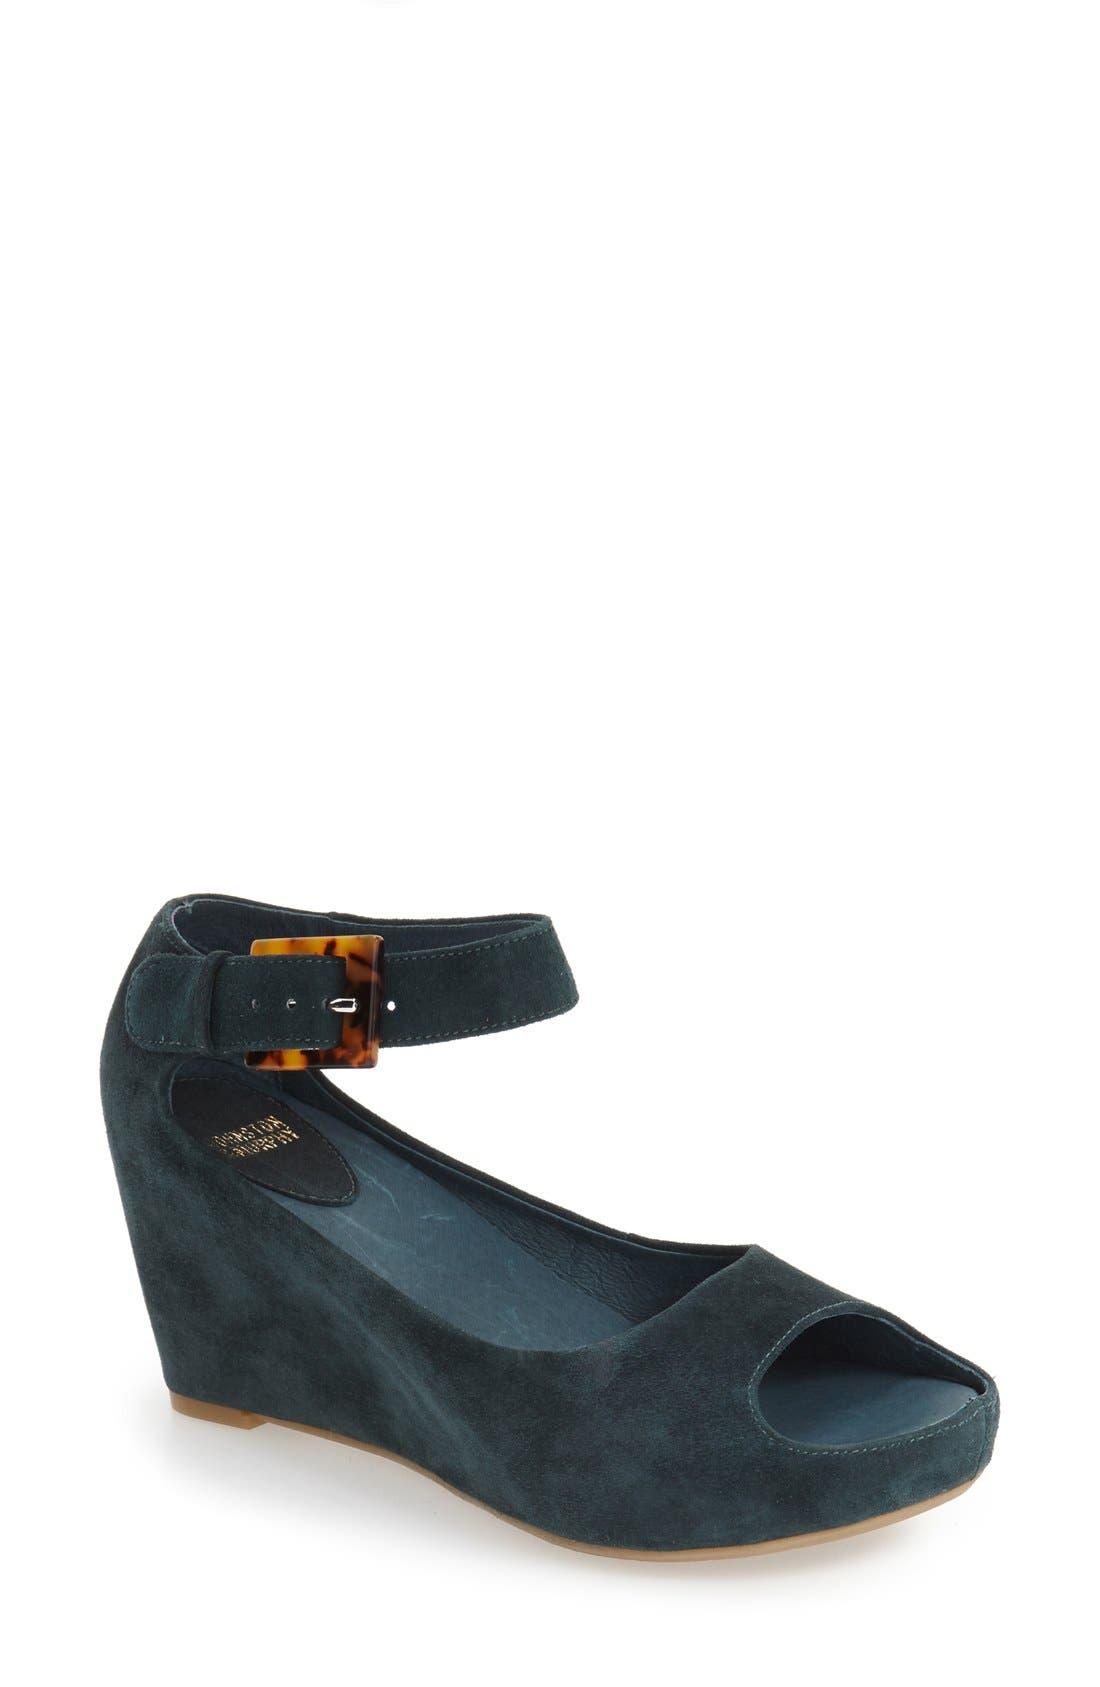 'Tricia' Ankle Strap Sandal,                             Main thumbnail 5, color,